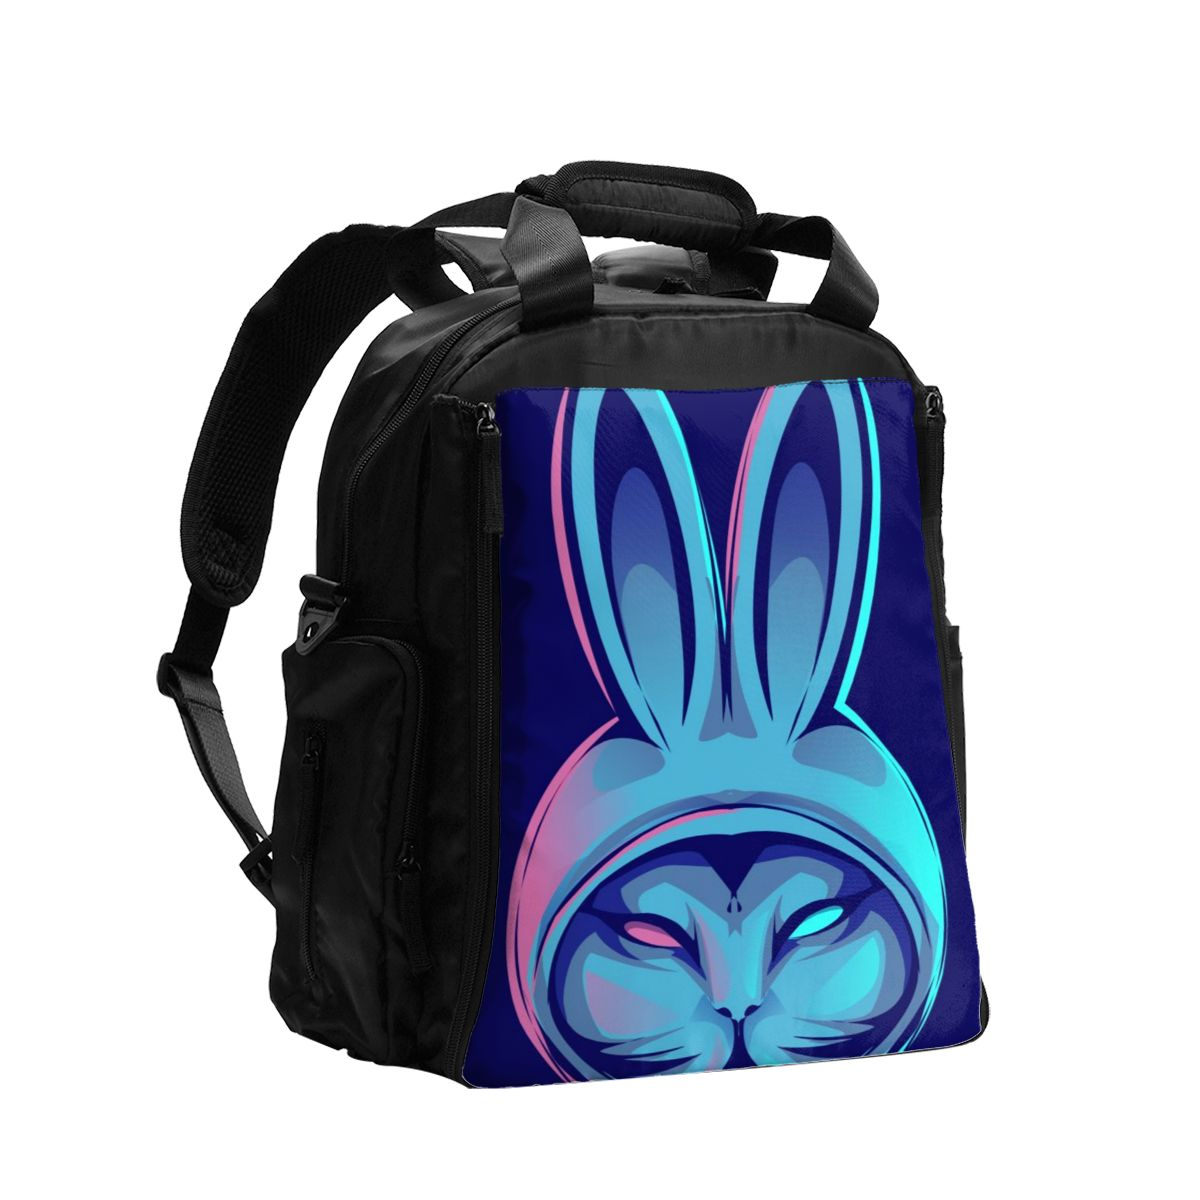 Bolsa de pañales para bebés Cool Rabbits bolsa de maternidad para pañales desechables reutilizables en seco bolsa de pañales con doble ASA